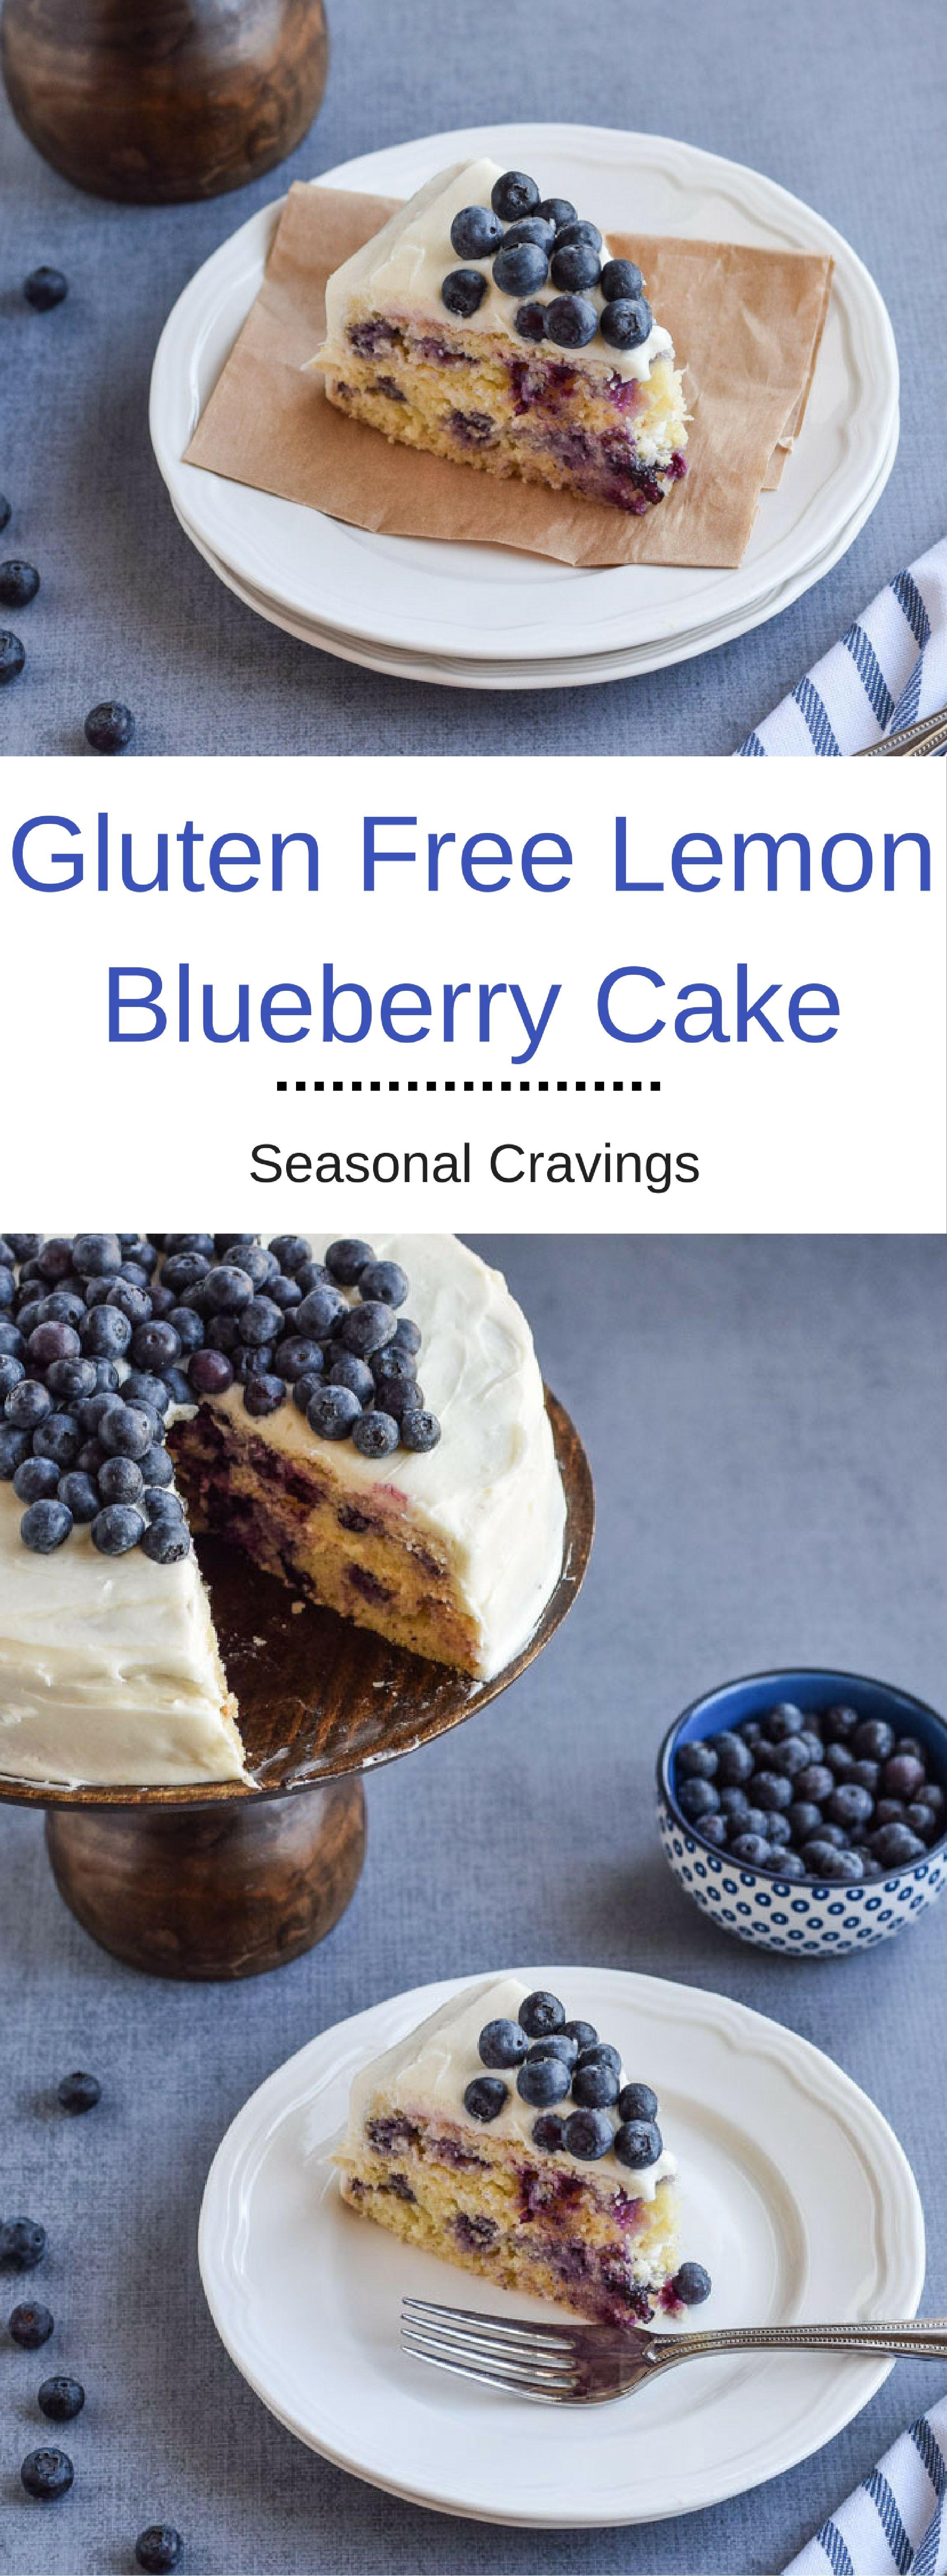 Gluten free lemon blueberry cake recipe spring baking